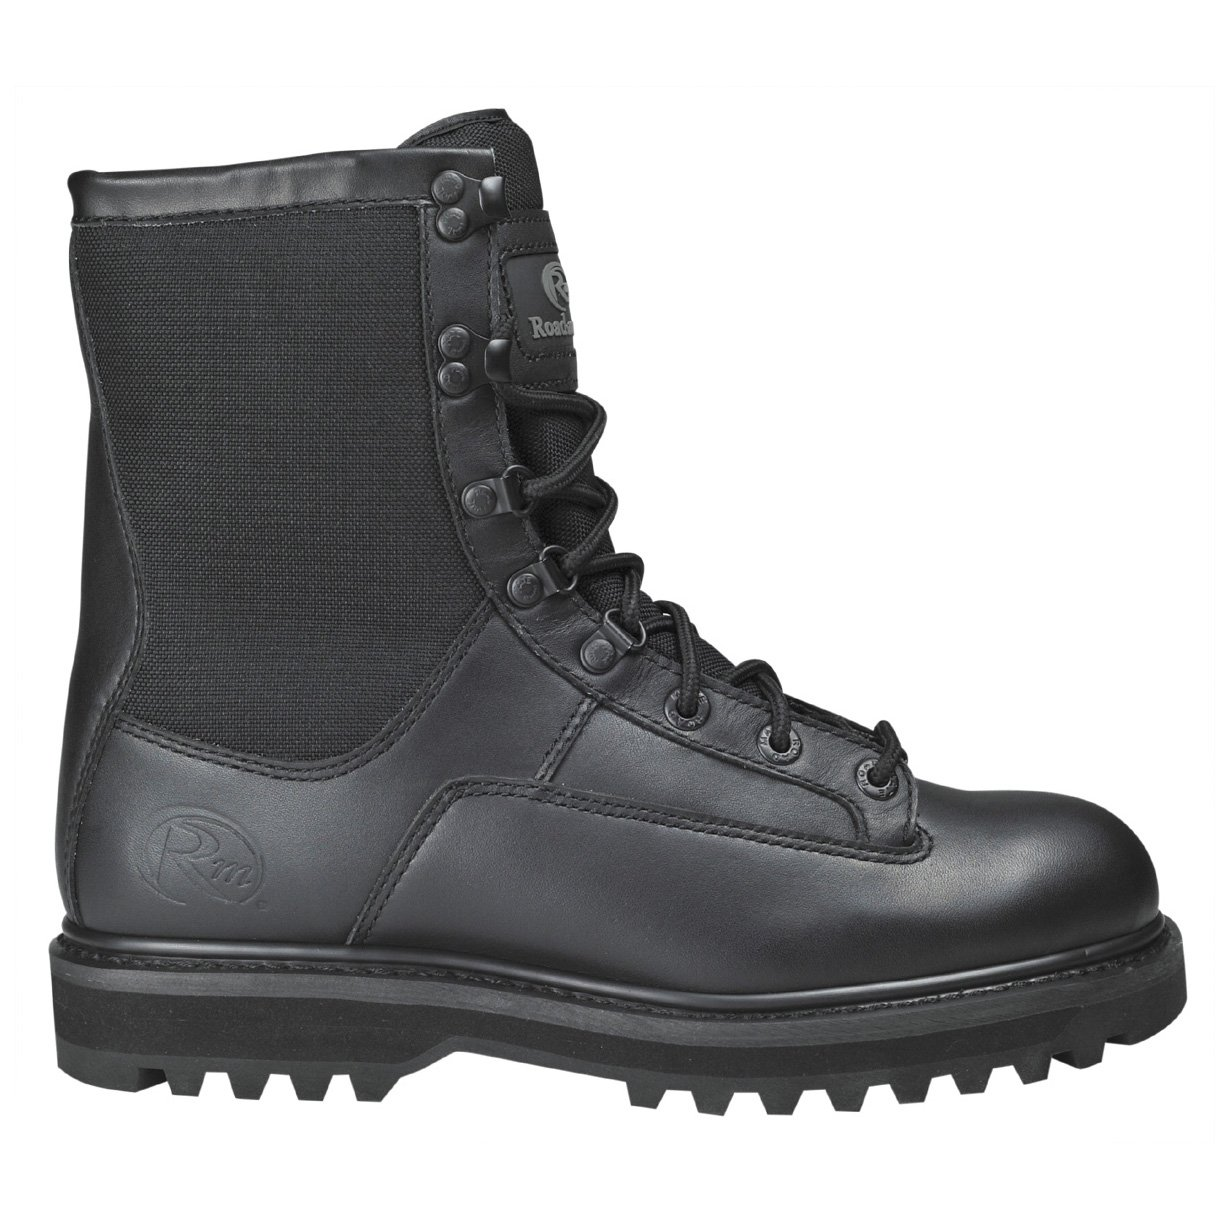 ROADMATE BOOT CO メンズ B00CWVPGAE 6.5 D(M) US|ブラック ブラック 6.5 D(M) US